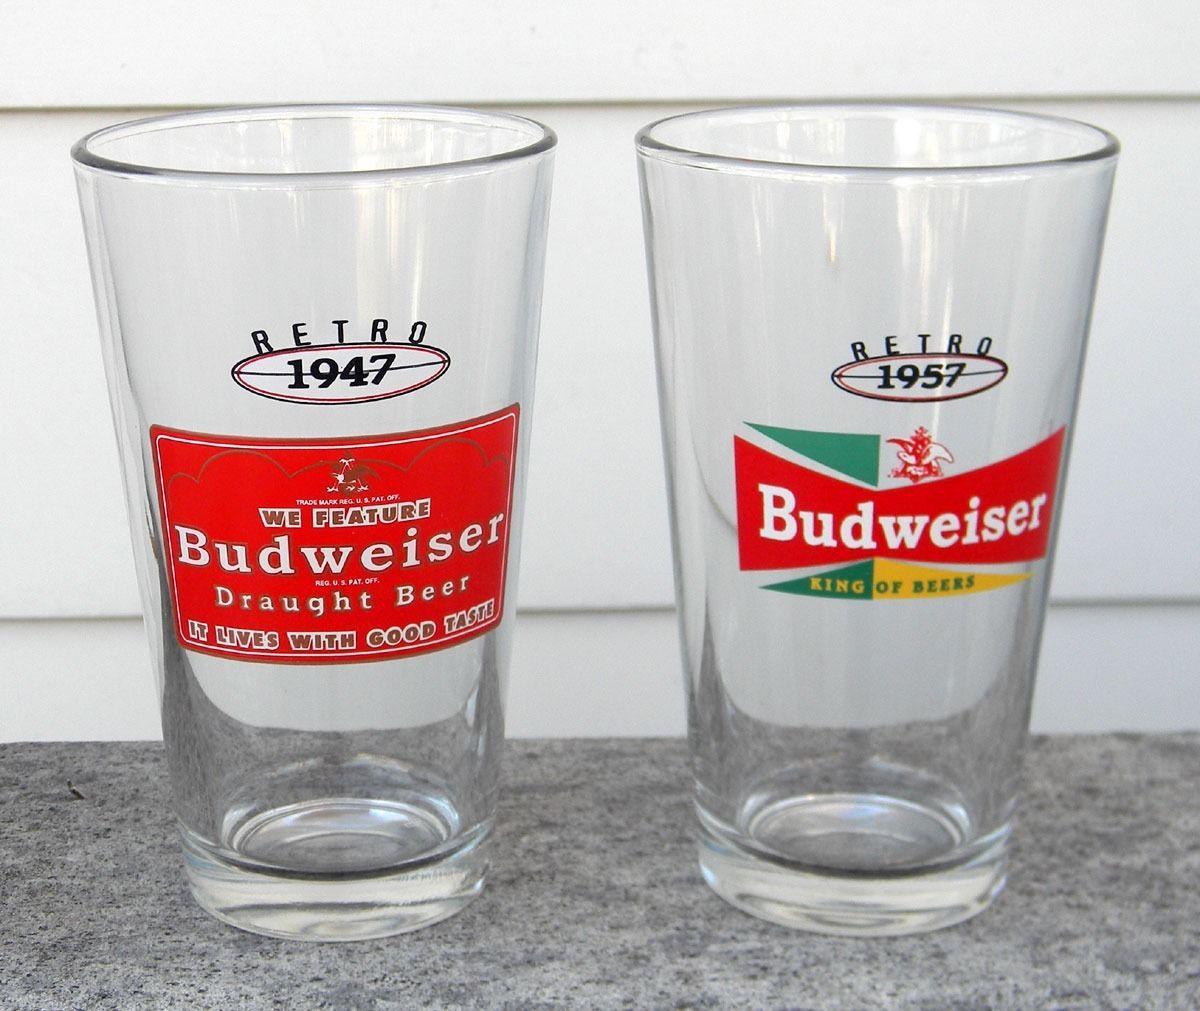 2 NEW BUDWEISER RETRO BEER PINT GLASSES 1947 1957 16 OZ BUD